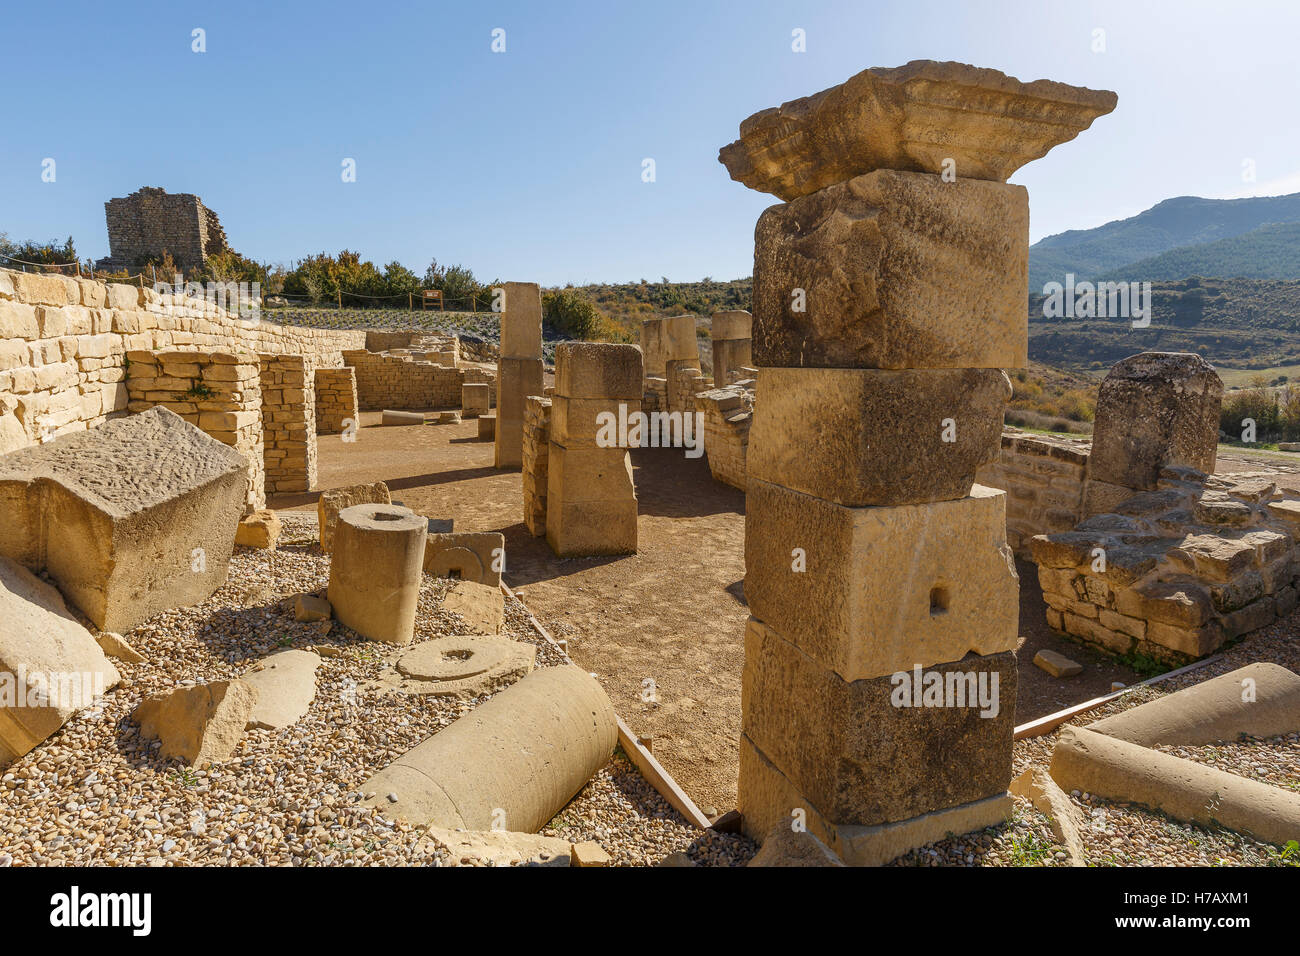 Ruins of Santa Criz Roman city. Eslava village. Navarra province. Spain. Europe Stock Photo